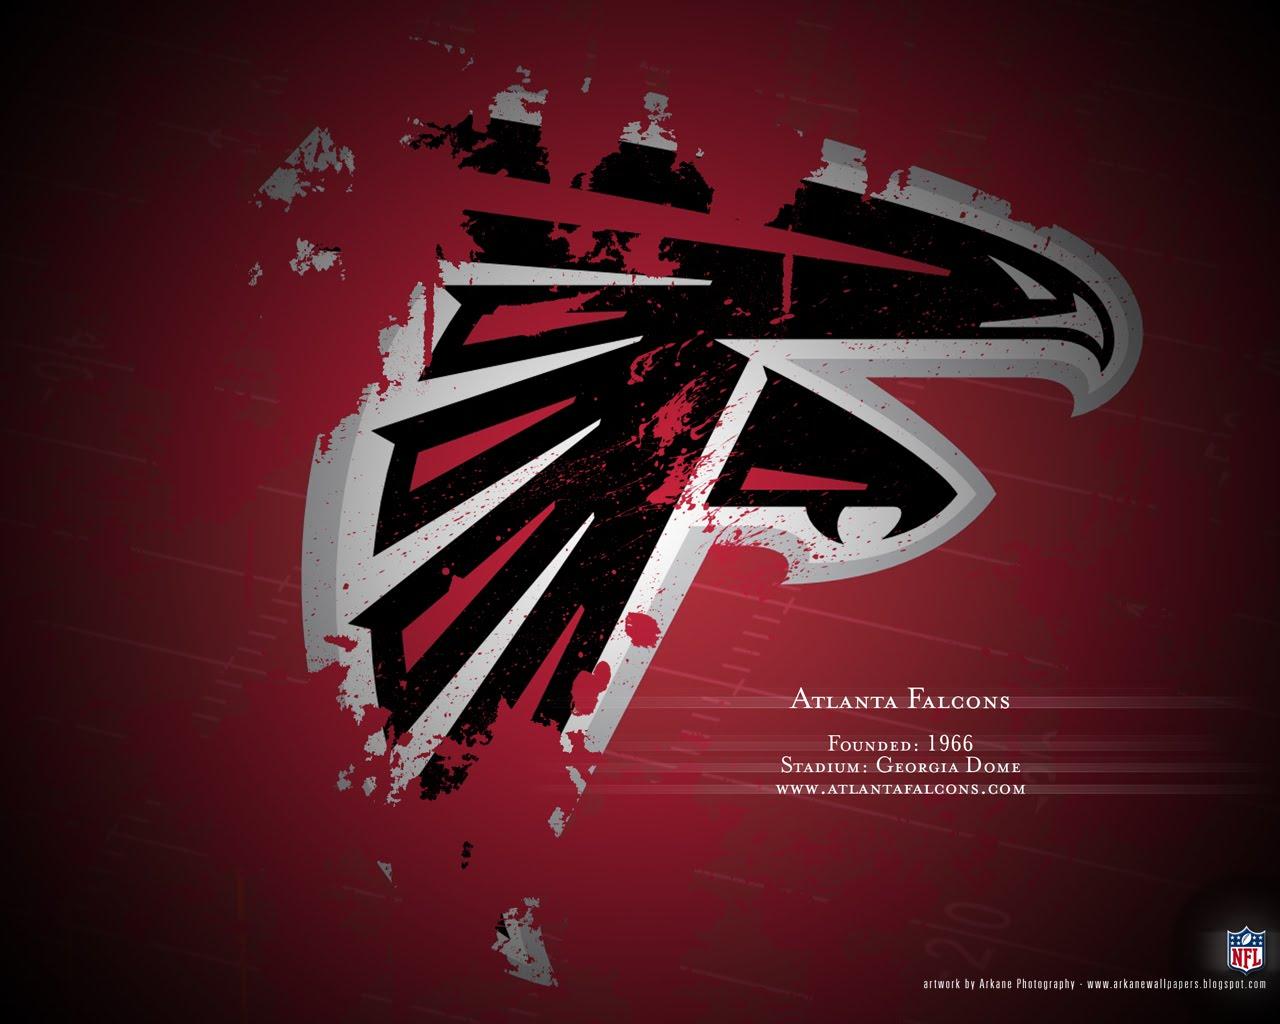 arkane nfl wallpapers profile atlanta falcons